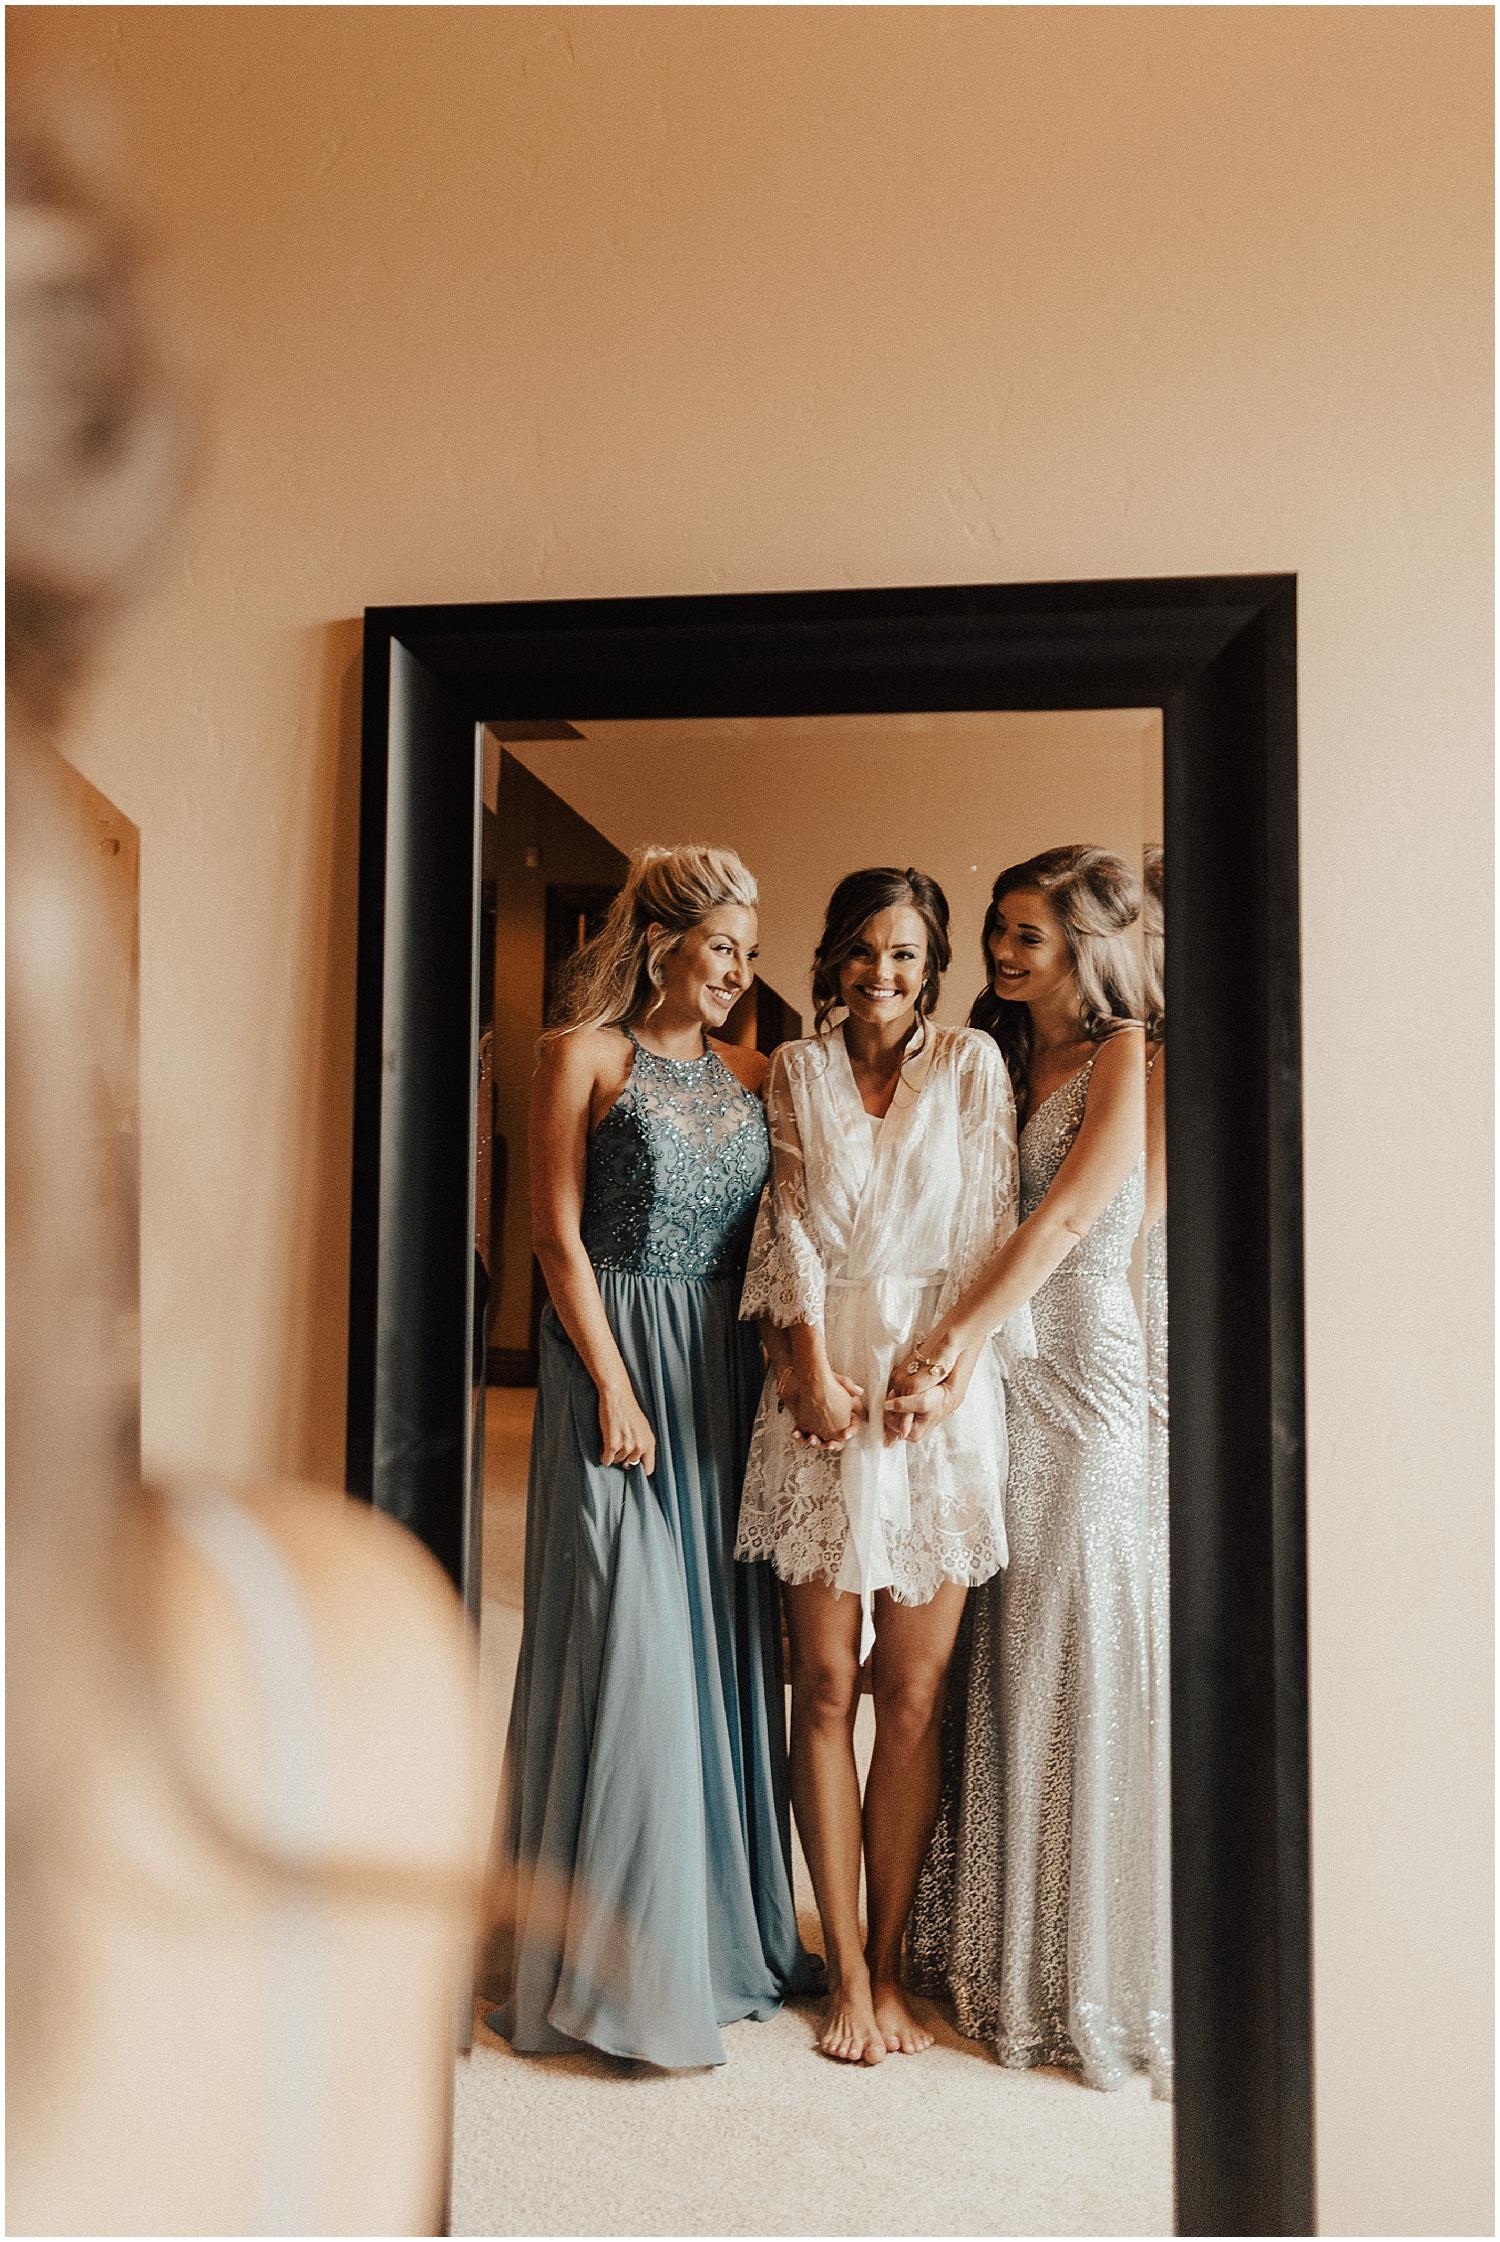 whimsical-summer-wedding-boise-idaho-las-vegas-bride61.jpg